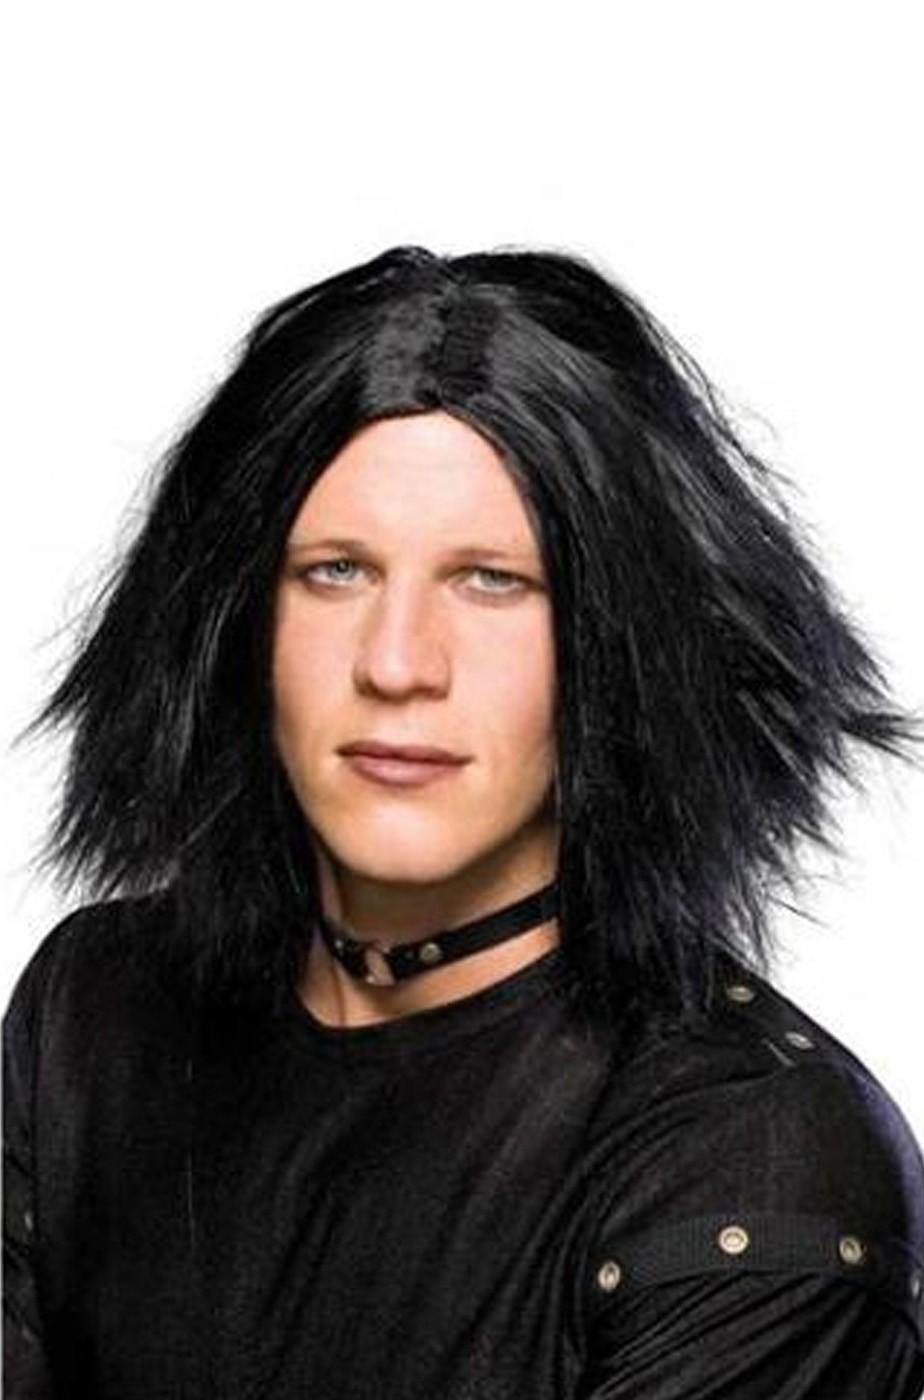 Parrucca uomo nera lunga liscia senza frangia emo o Il corvo